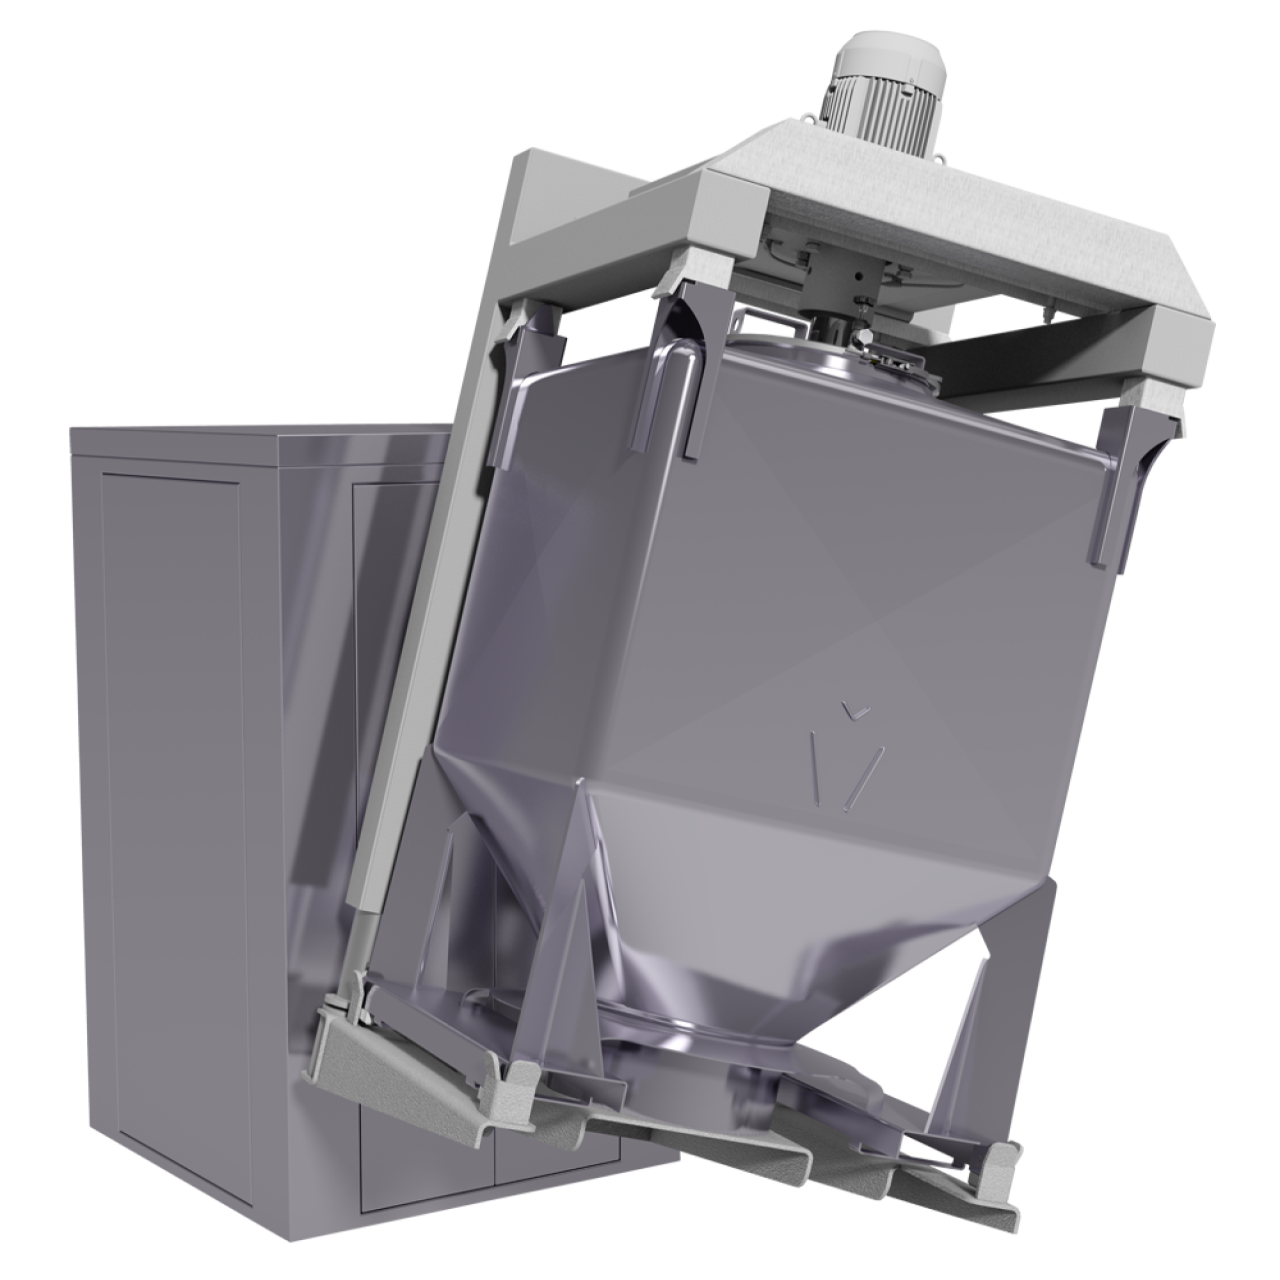 IBC Blender 1280x1280